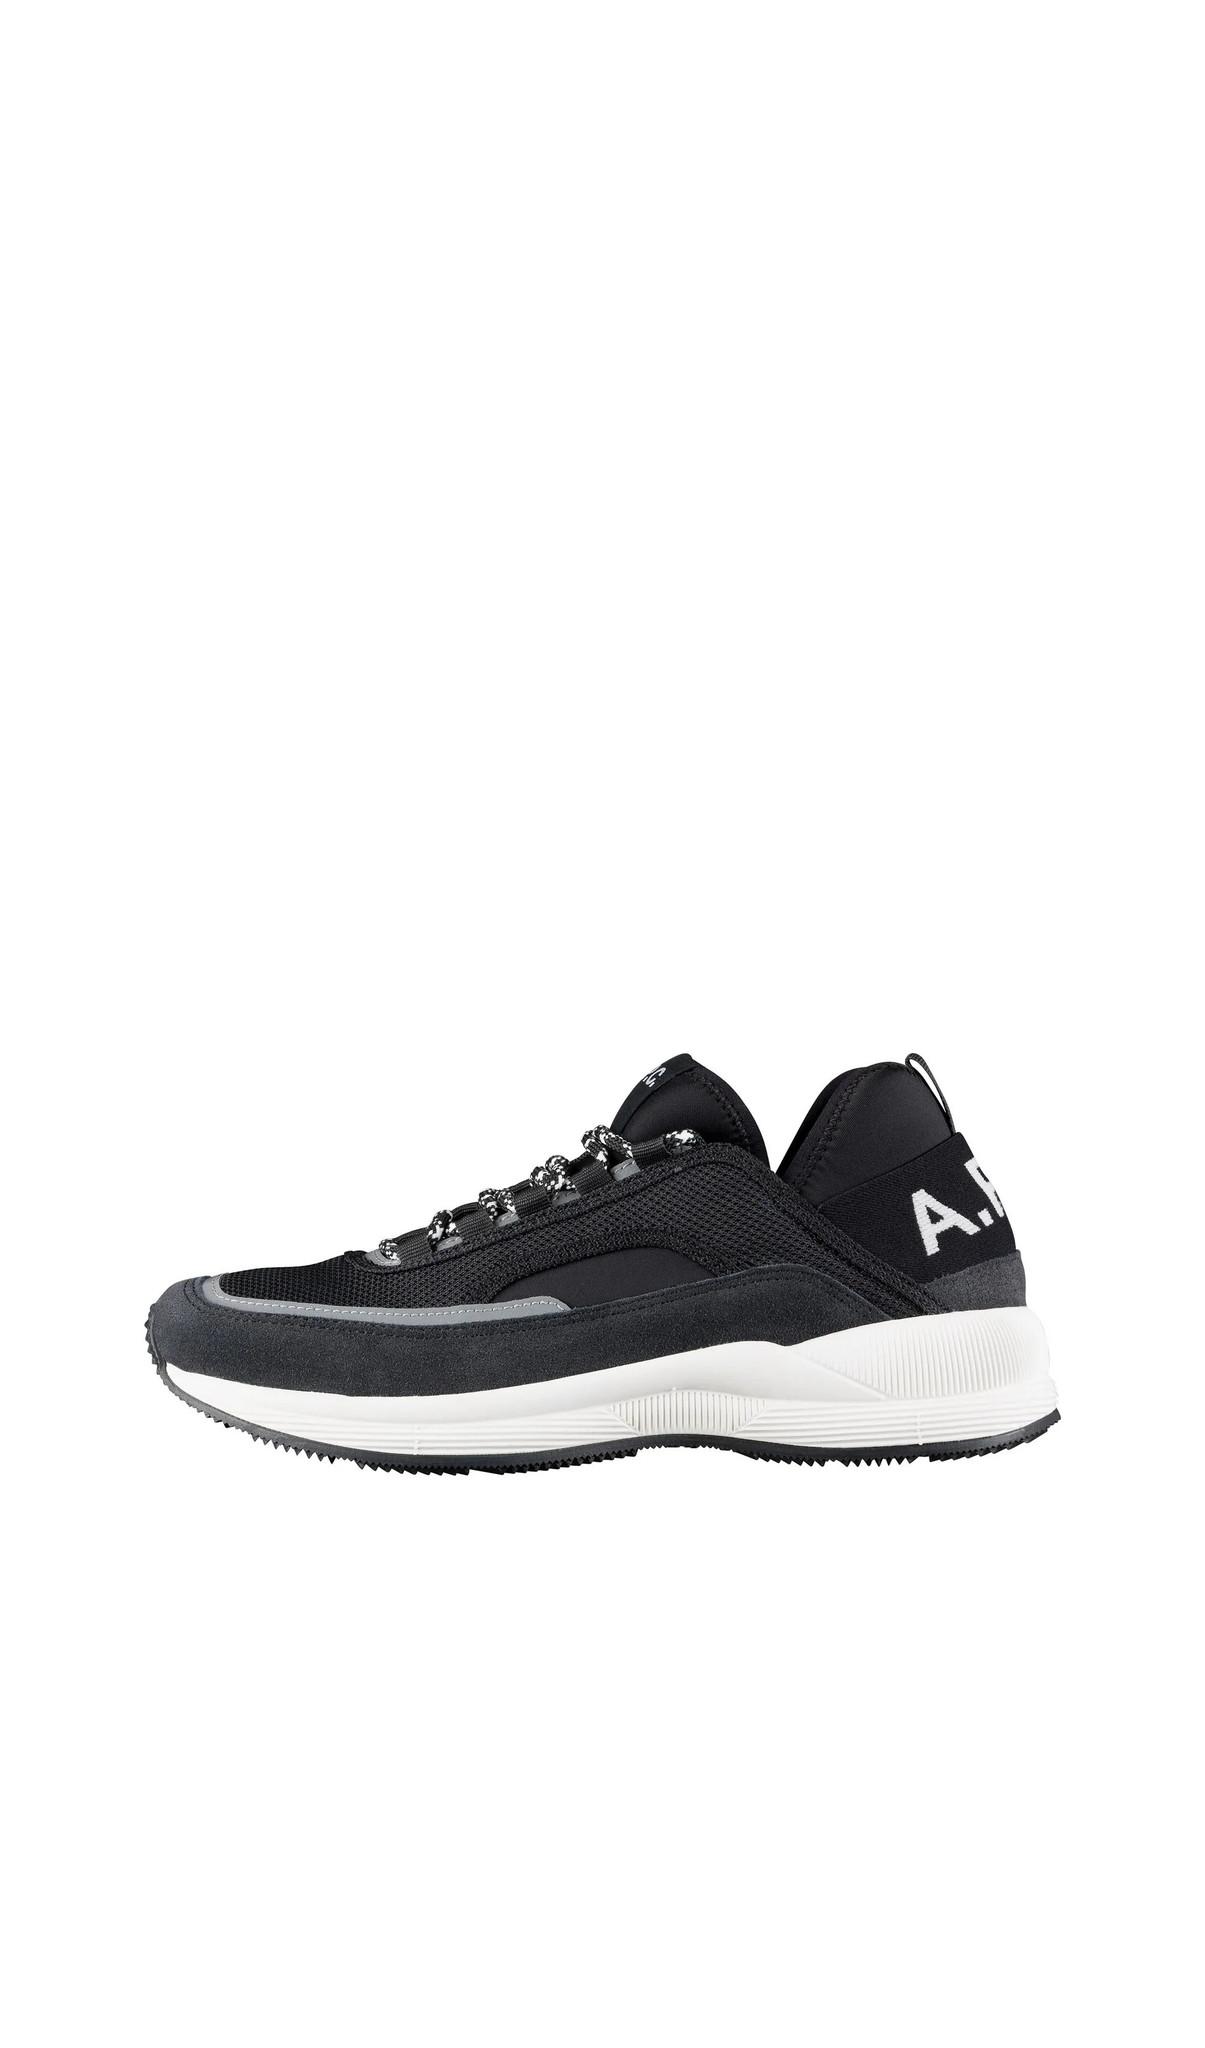 Run around sneakers Anthracite